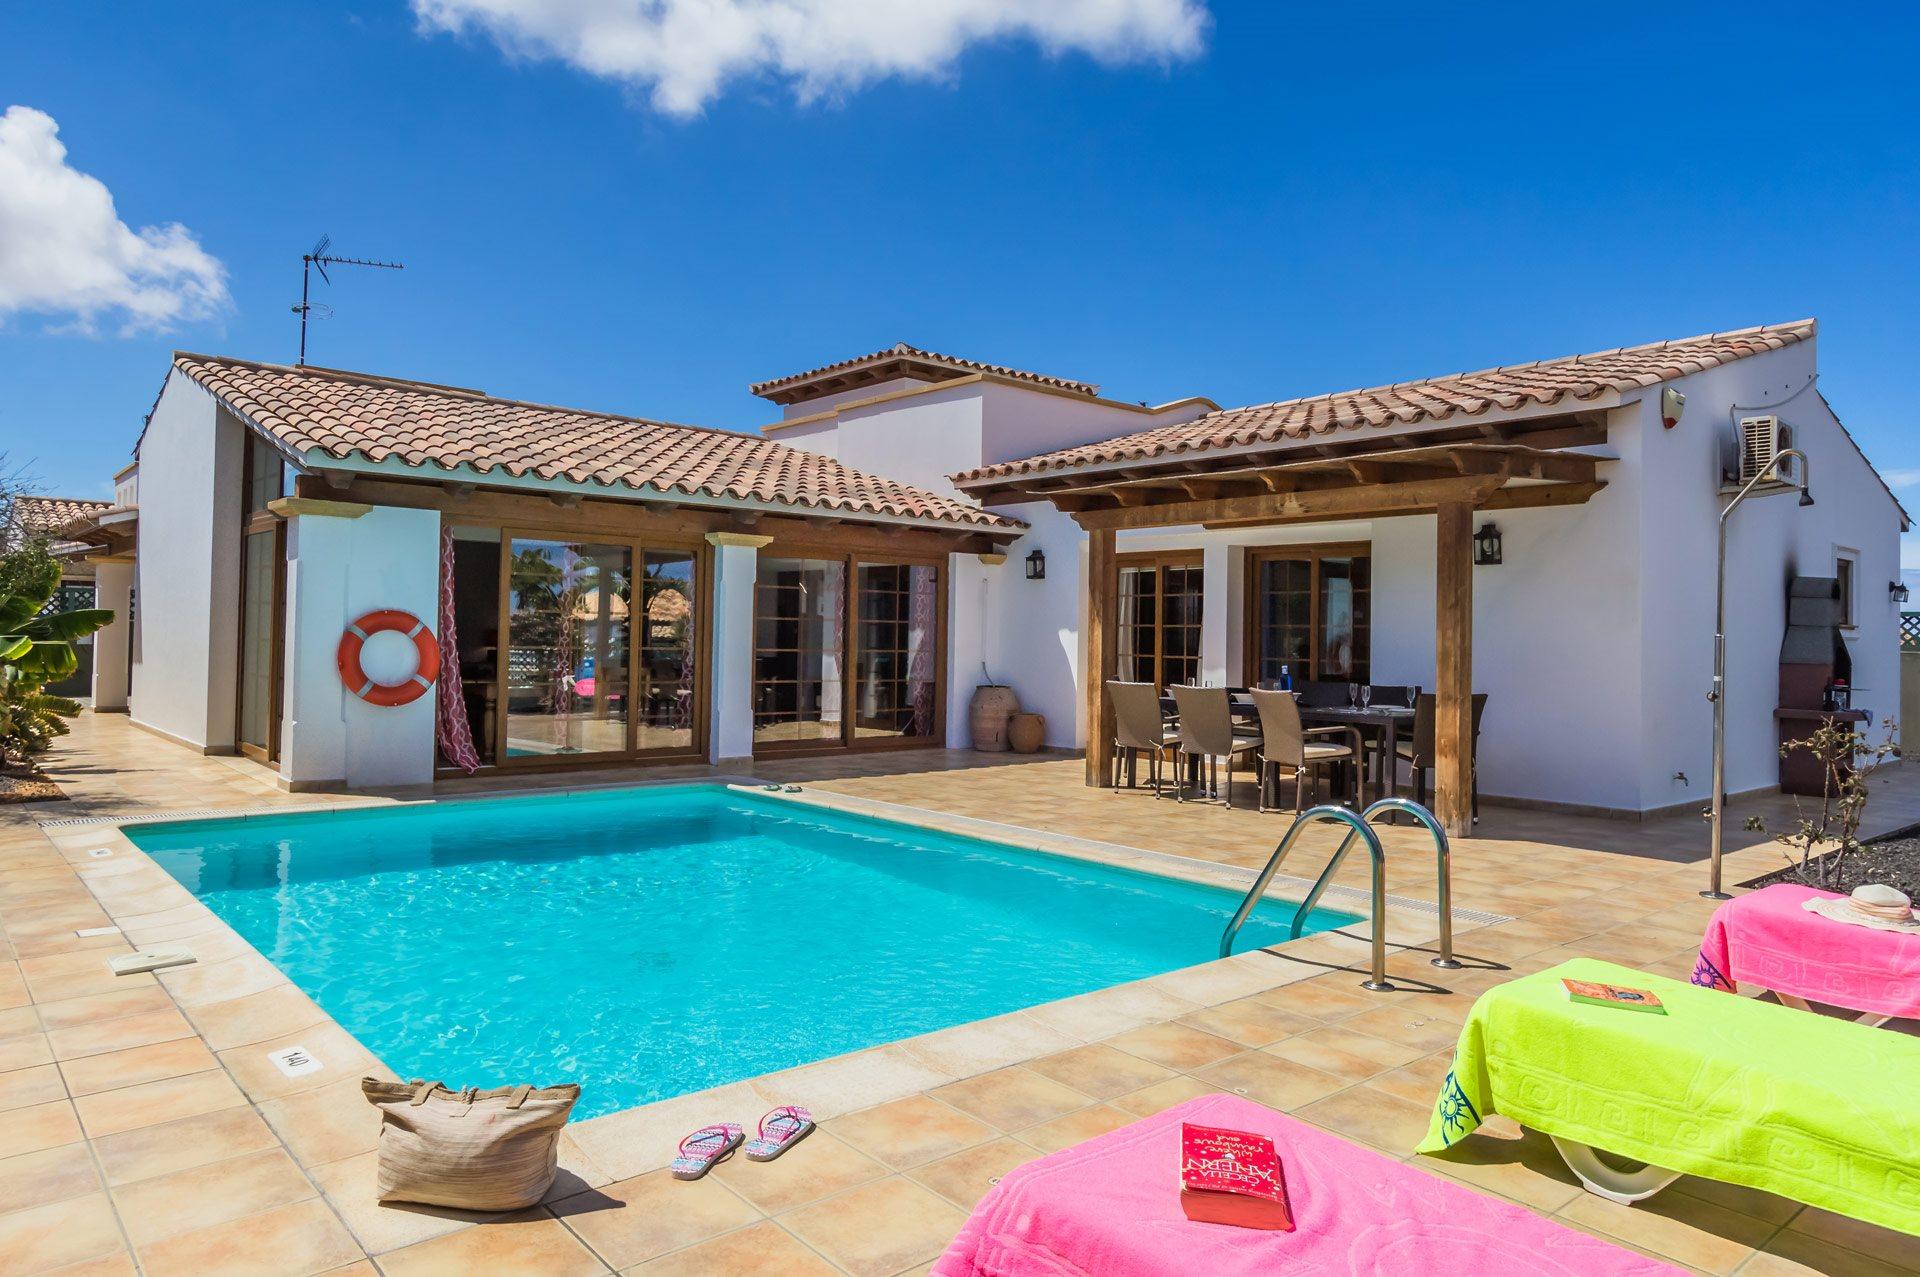 Villa Sherry, Corralejo, Fuerteventura